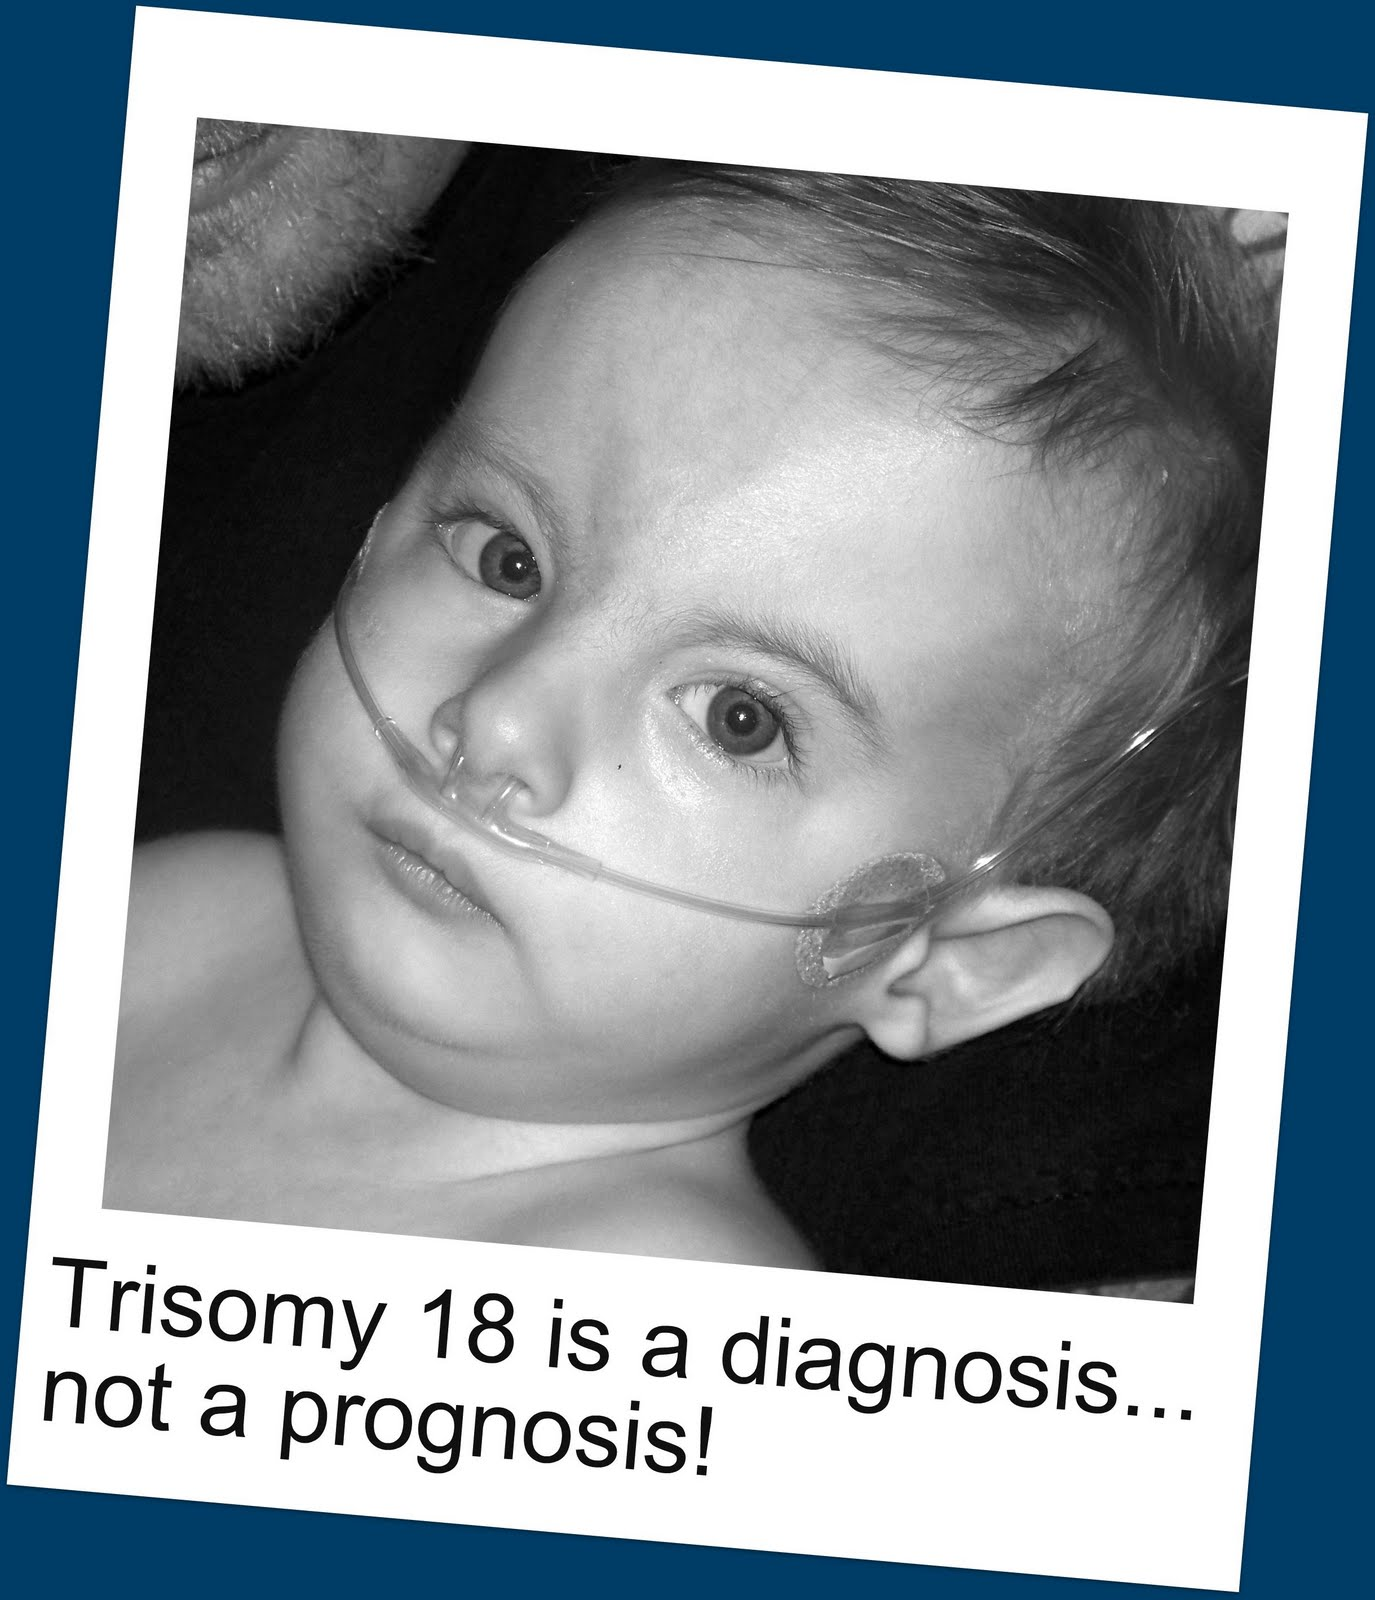 Trisomy Genetics Home Reference